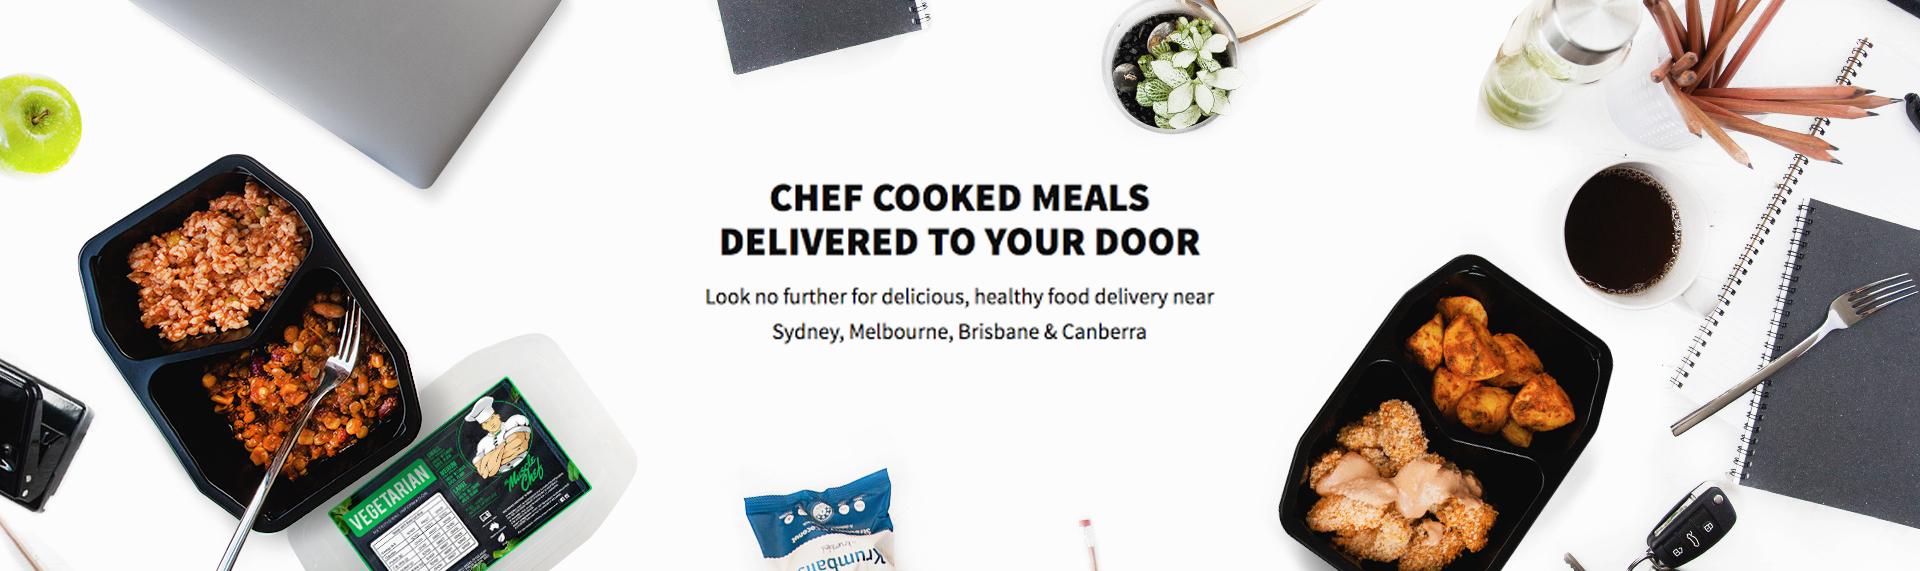 Weight loss meals plan delivered sydney diet meals delivery forumfinder Images